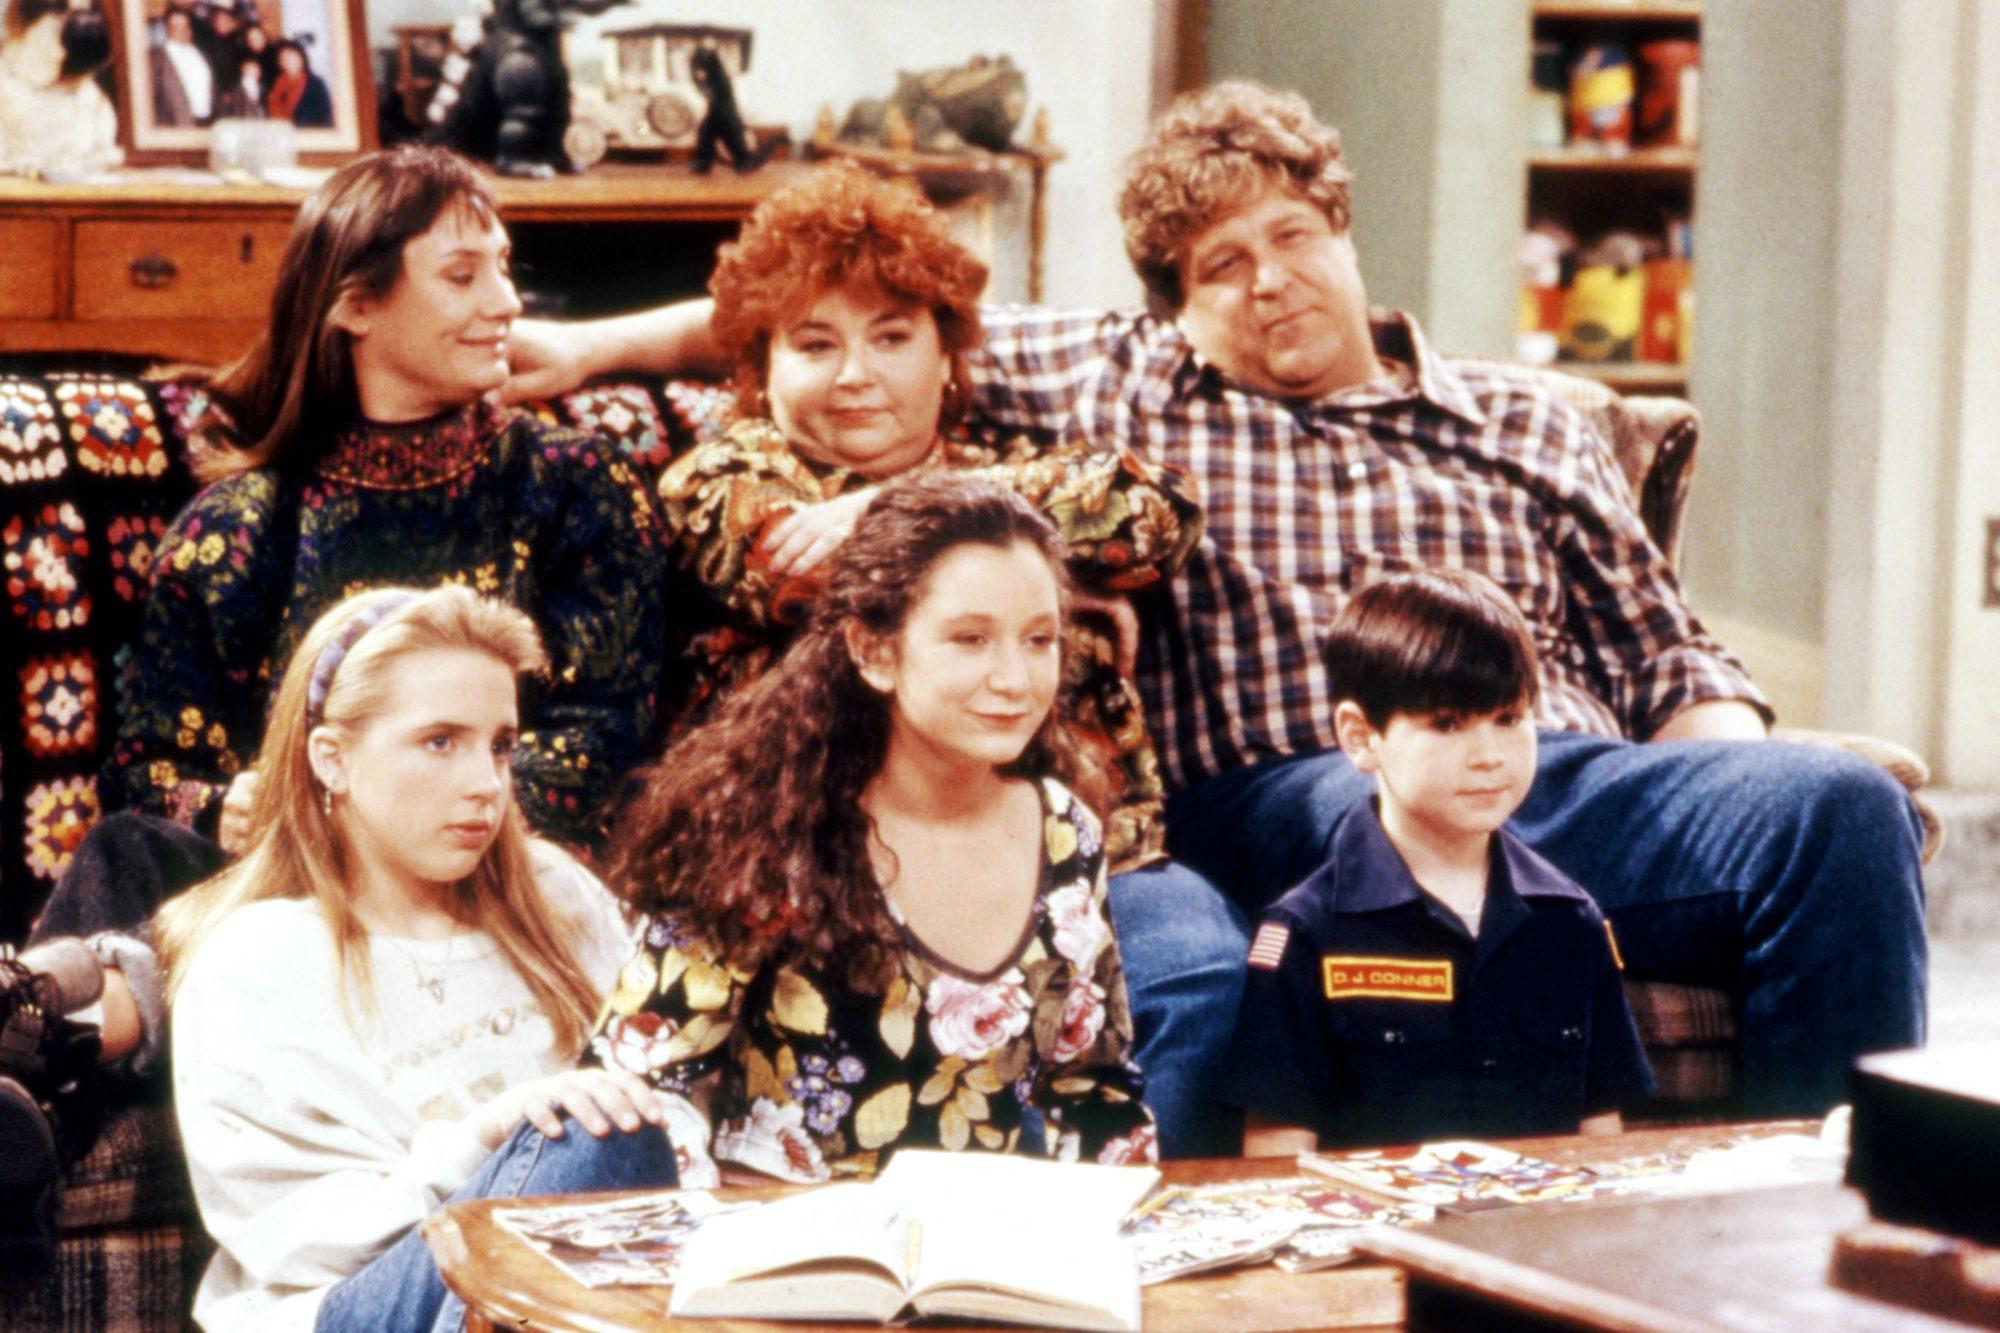 ROSEANNE, (Front) Alicia Goranson, Sara Gilbert, Michael Fishman, (Rear) Laurie Metcalf, Roseanne, J